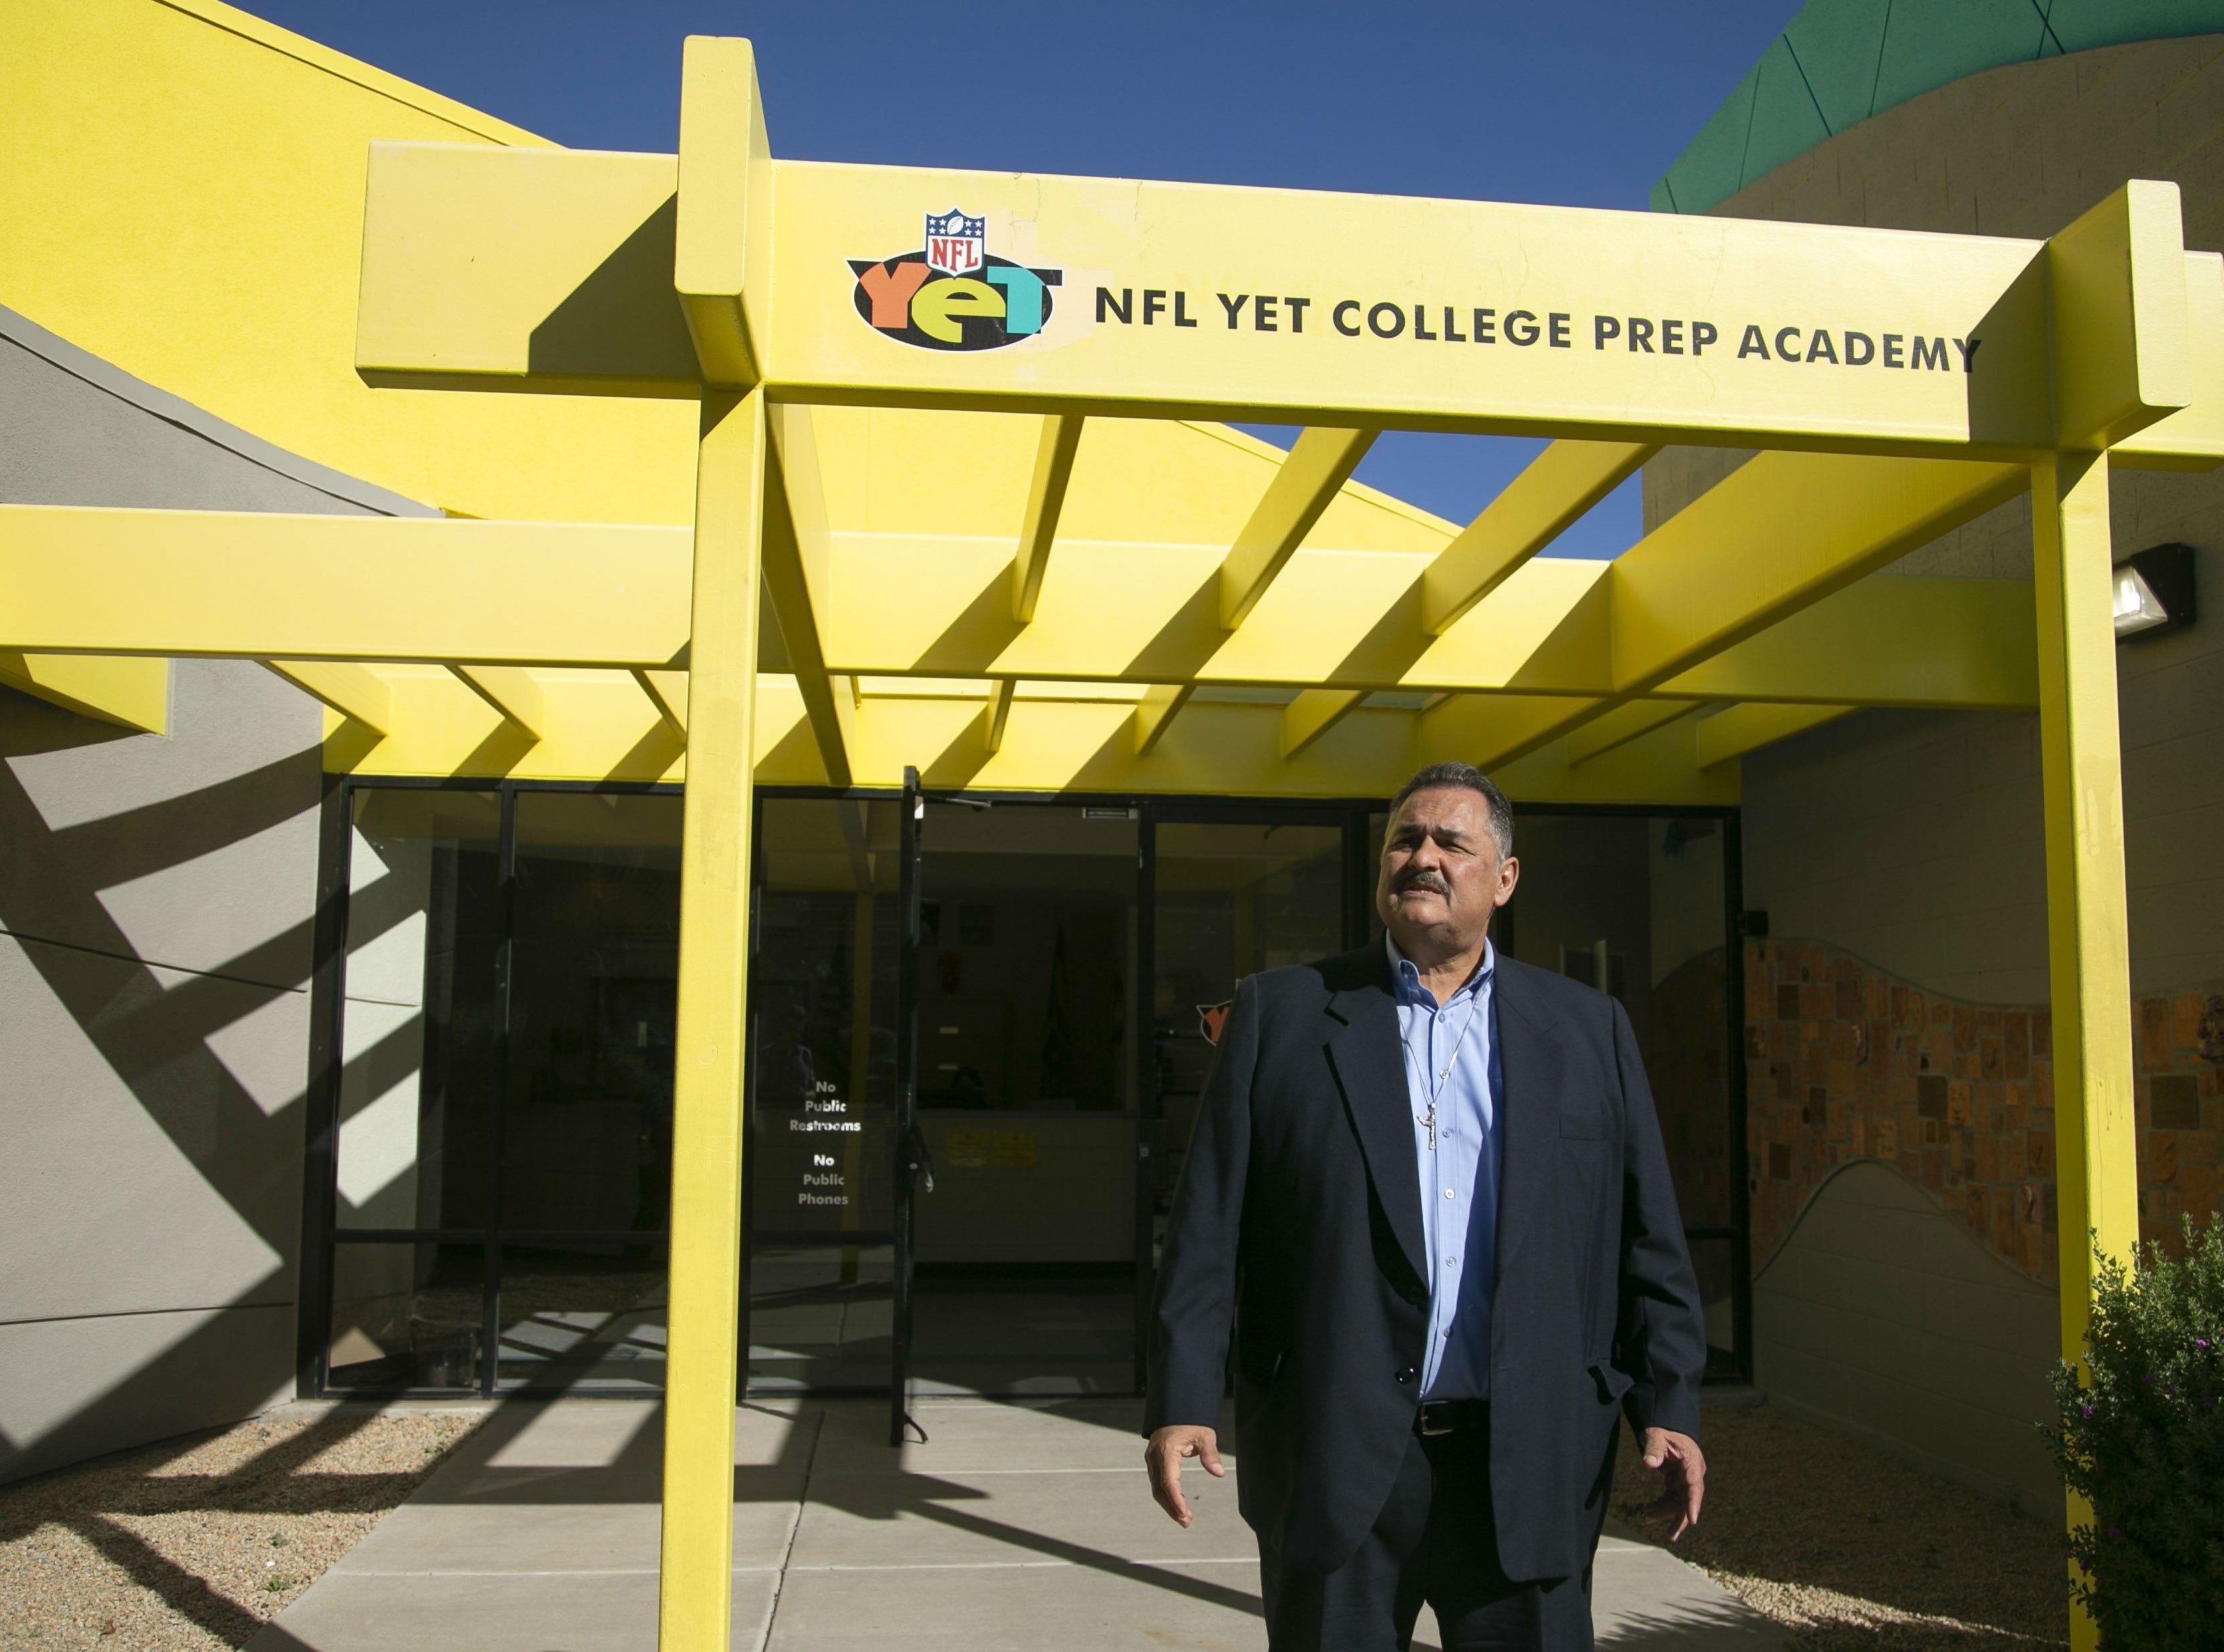 Armando Ruiz, a senior advisor with the Espiritu Community Development Corporation is seen at the NFL YET College Prep Academy on Nov. 5, 2018.  Espiritu Community Development Corporation controls severall charter schools including NFL YET College Prep Academy.